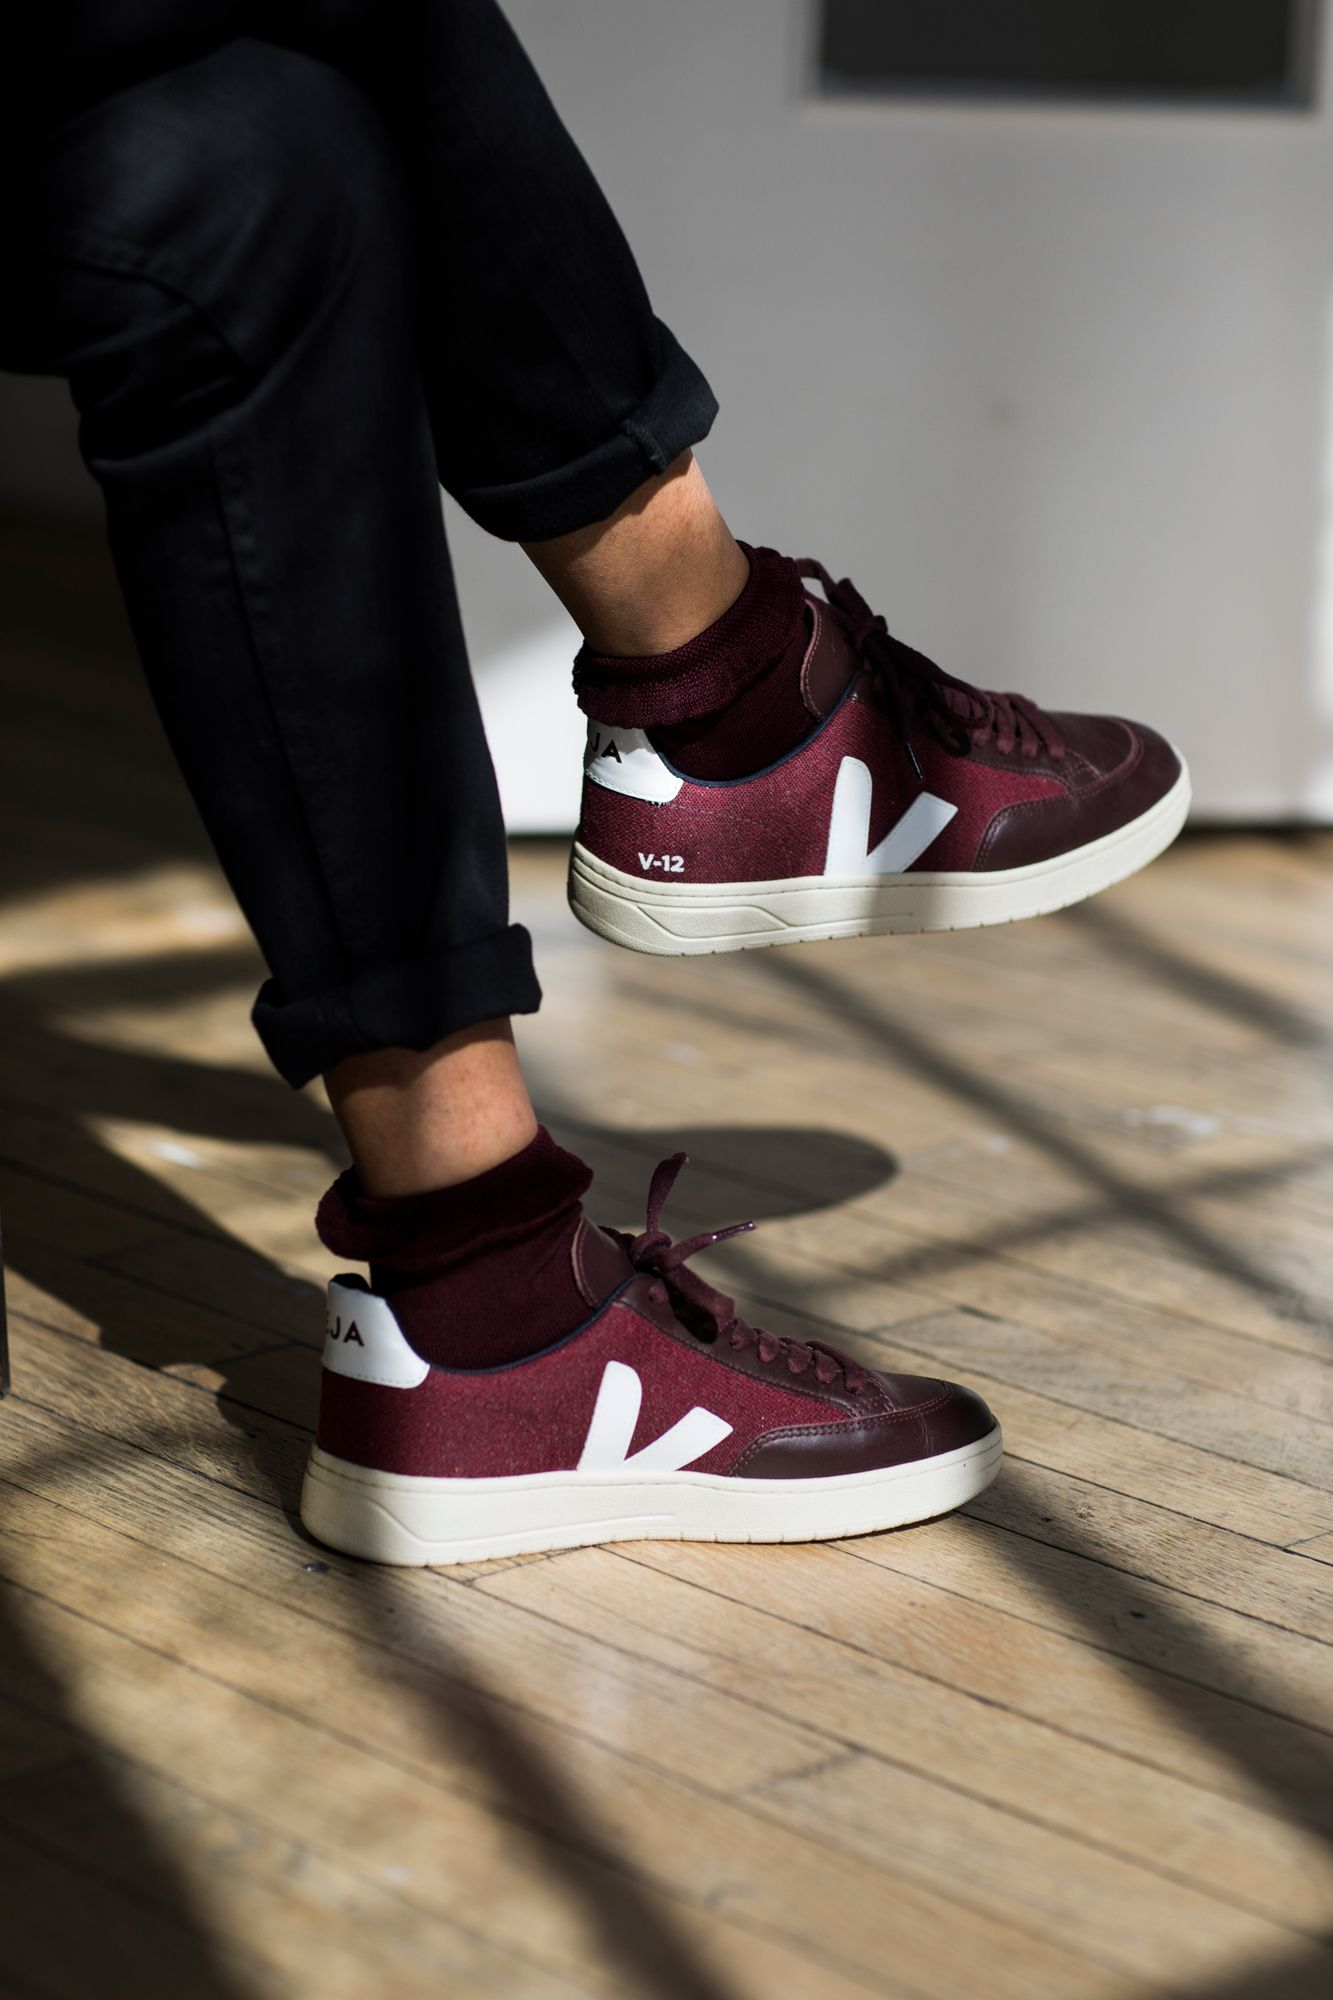 veja #vejav12 #kicksoftheday #sneakers